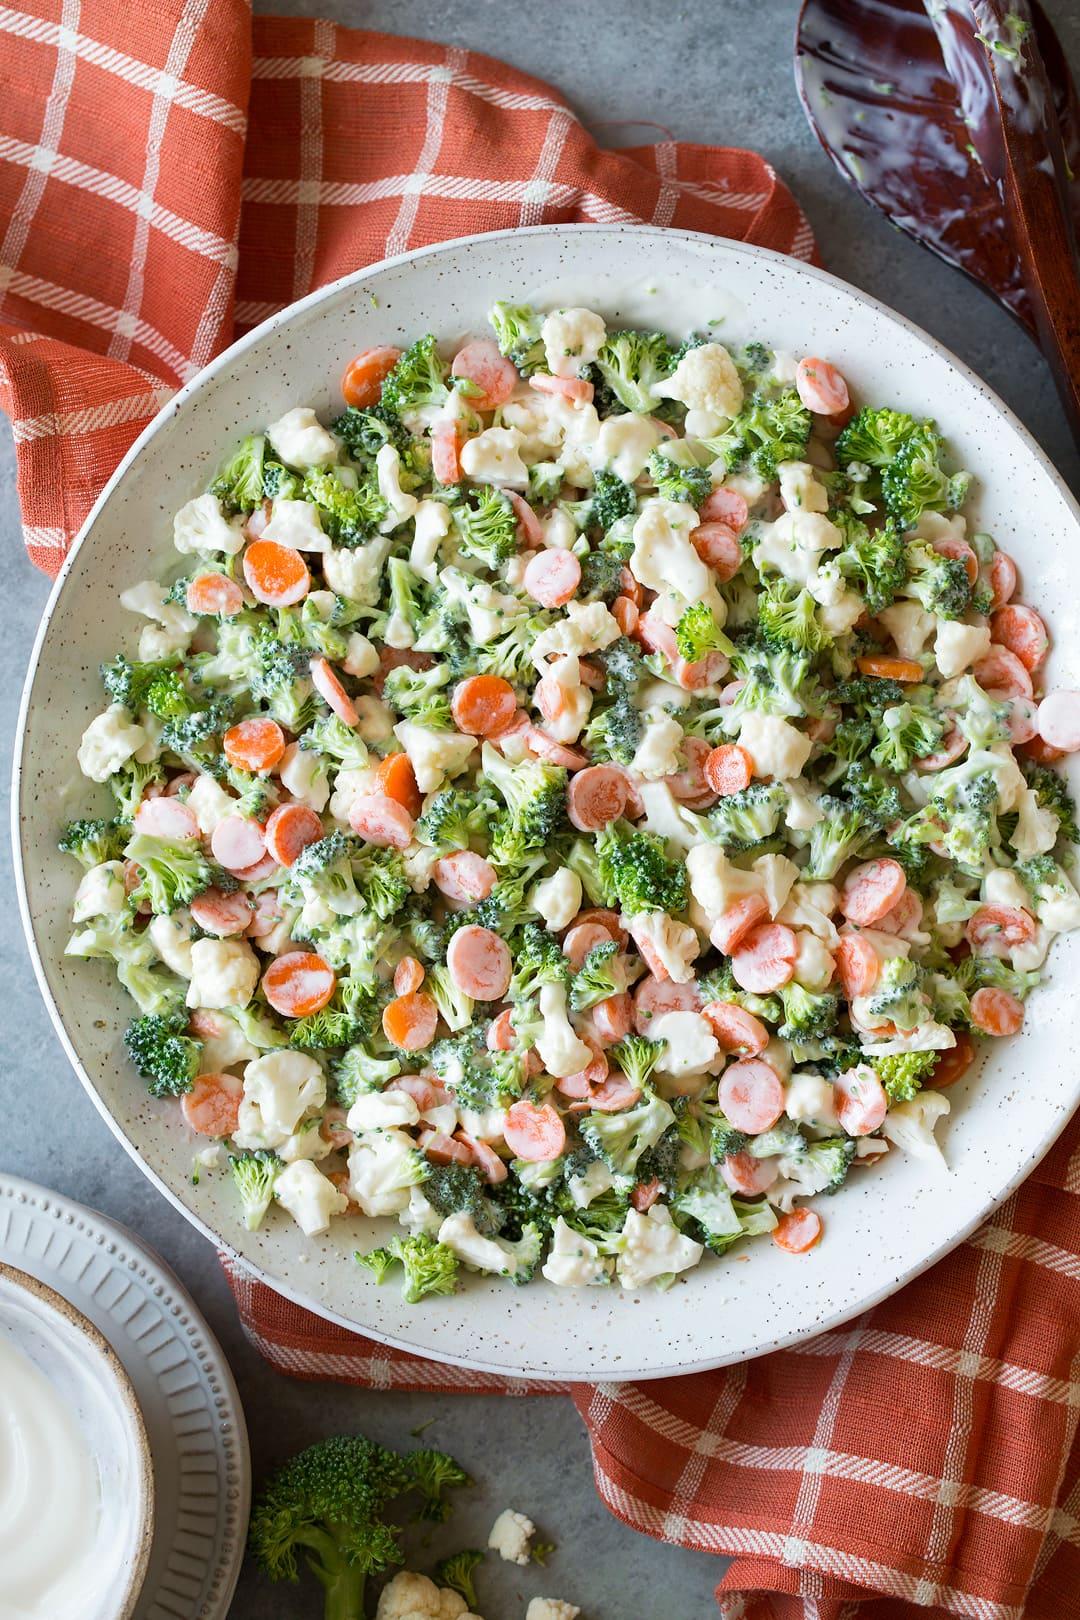 Broccoli Carrot Cauliflower Coleslaw Salad